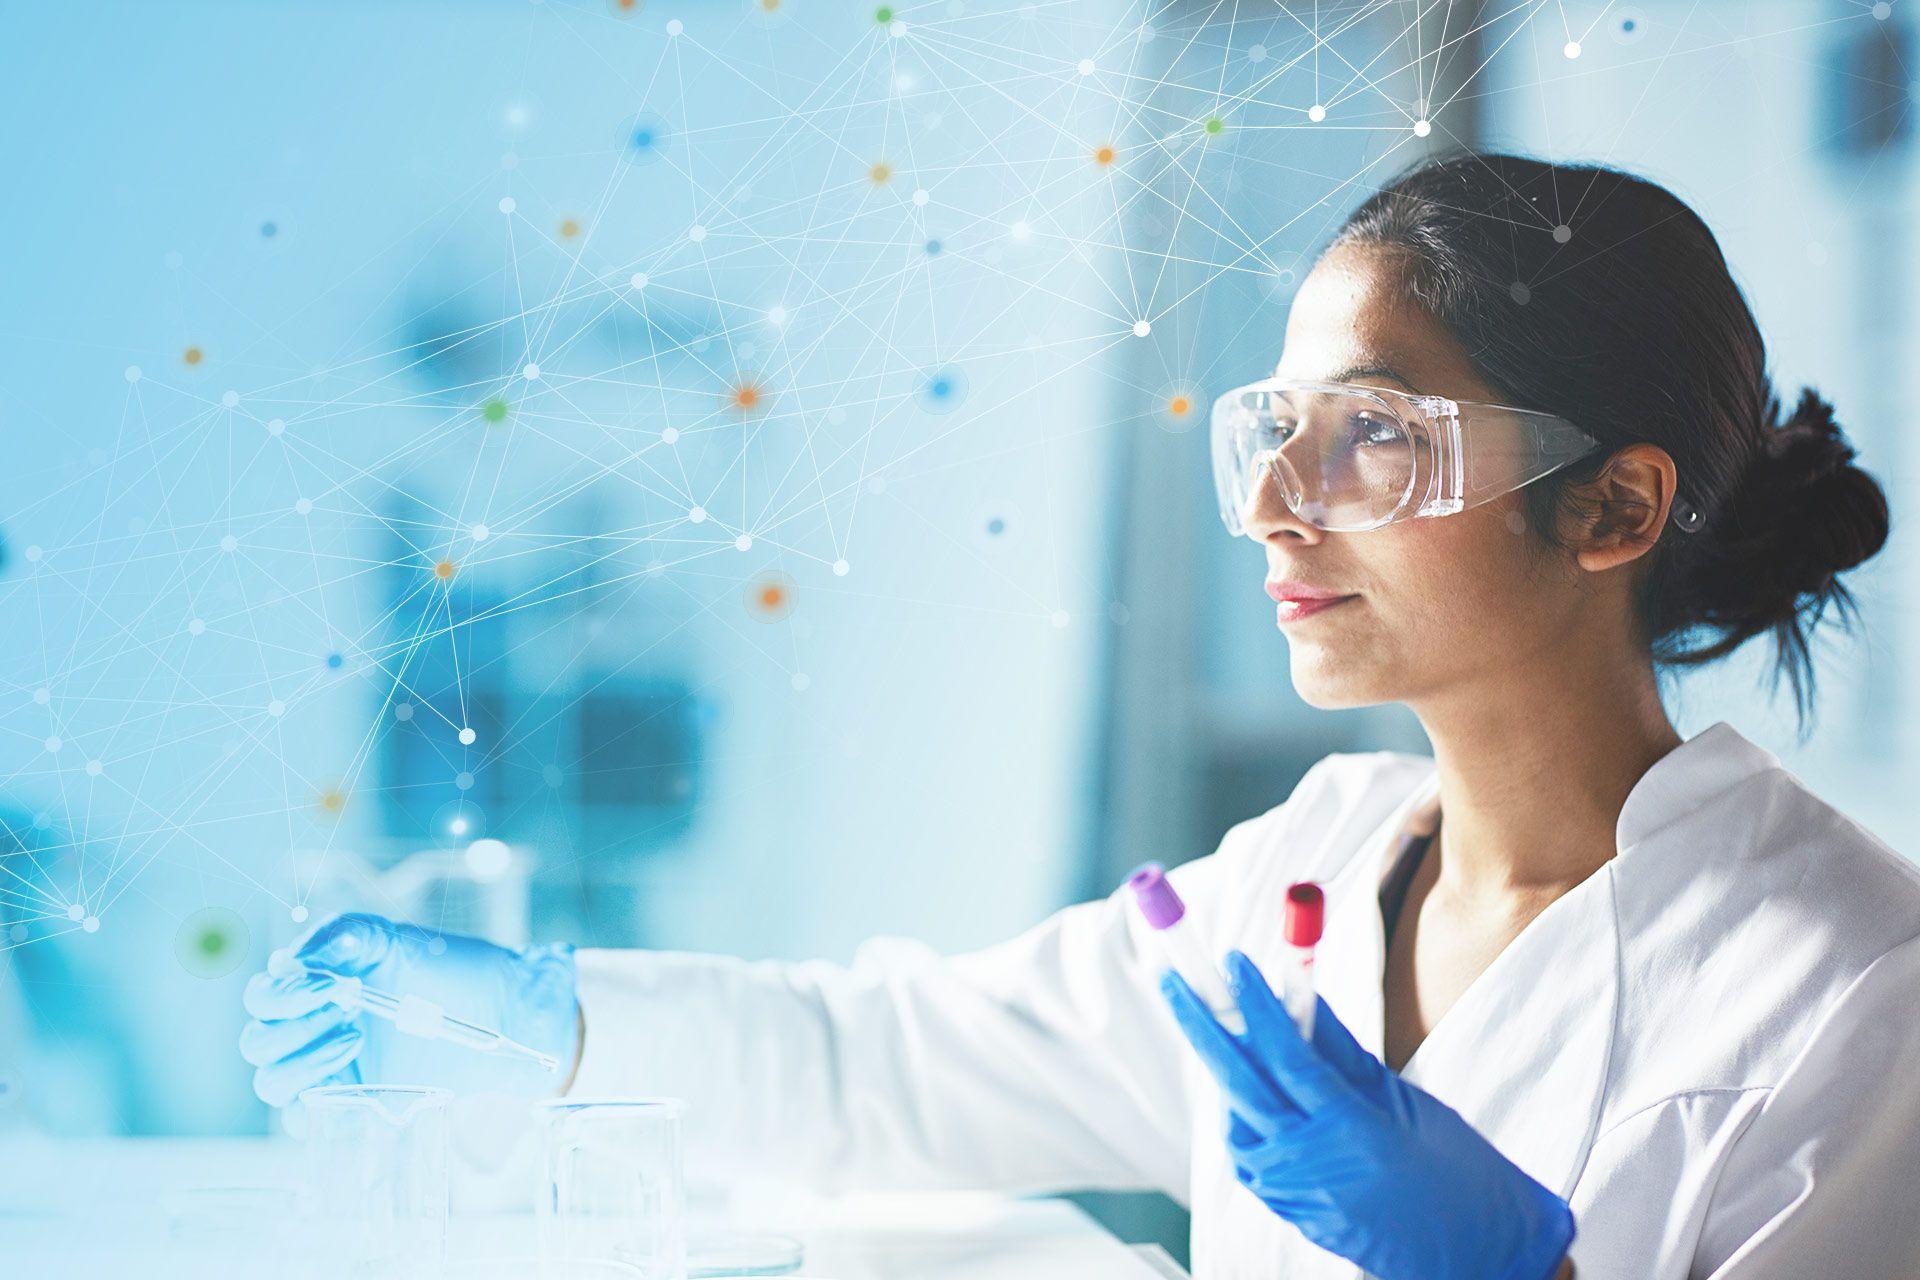 JSR-Life-Sciences-Scientist2-asterism-2020APR03